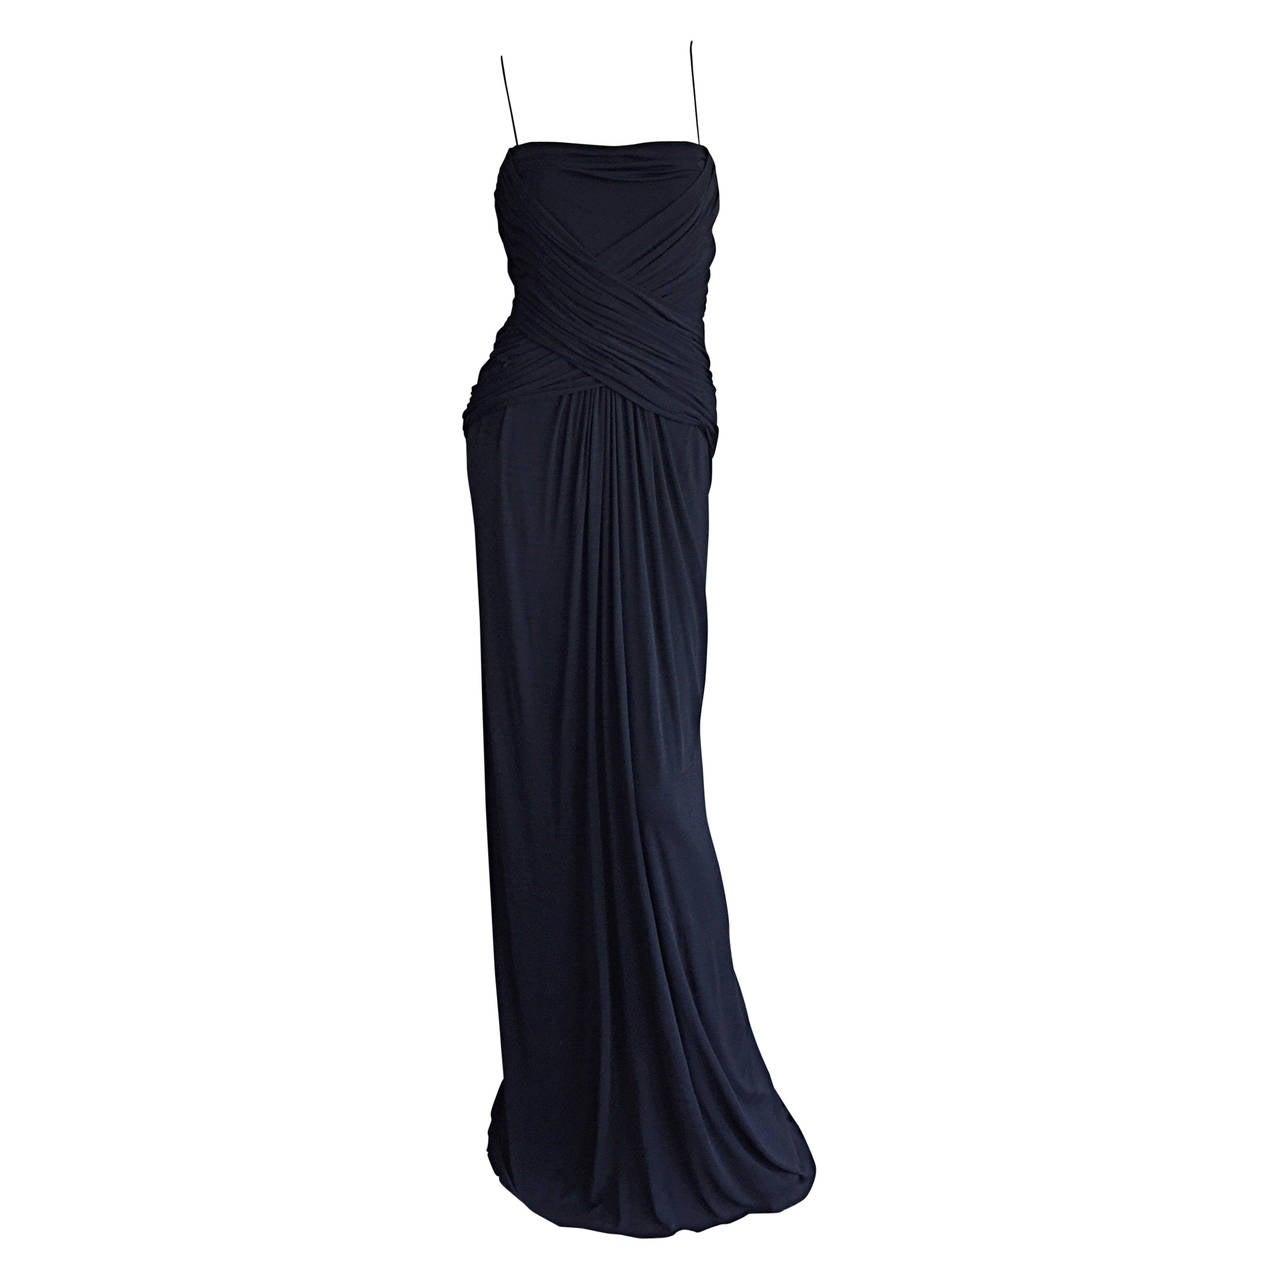 Fine + Rare 1970s Bob Mackie Black Jersey Grecian Goddess Gown For ...